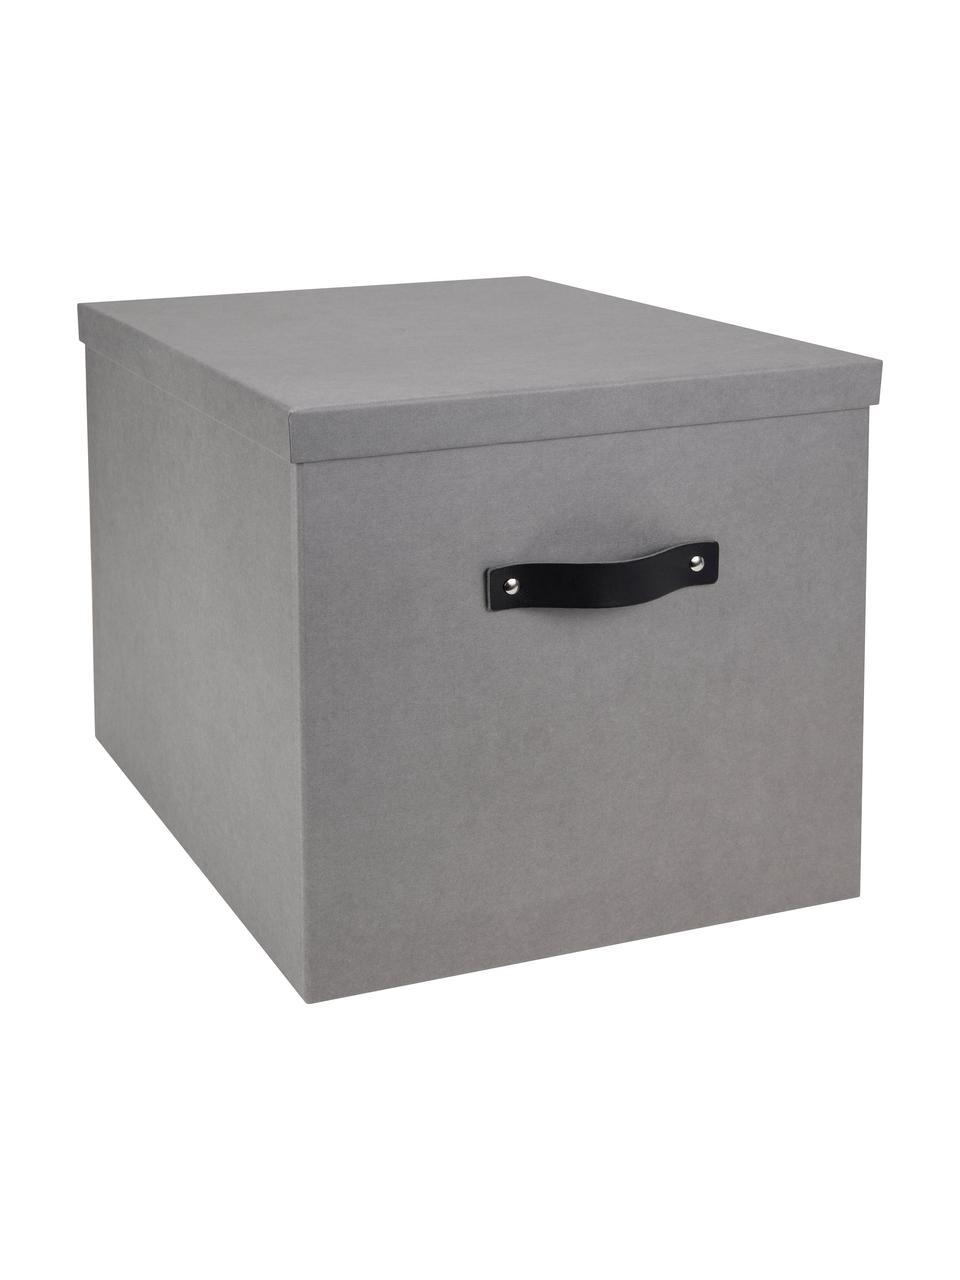 Aufbewahrungsbox Texas, Box: Fester, laminierter Karto, Griff: Leder, Hellgrau, 32 x 32 cm